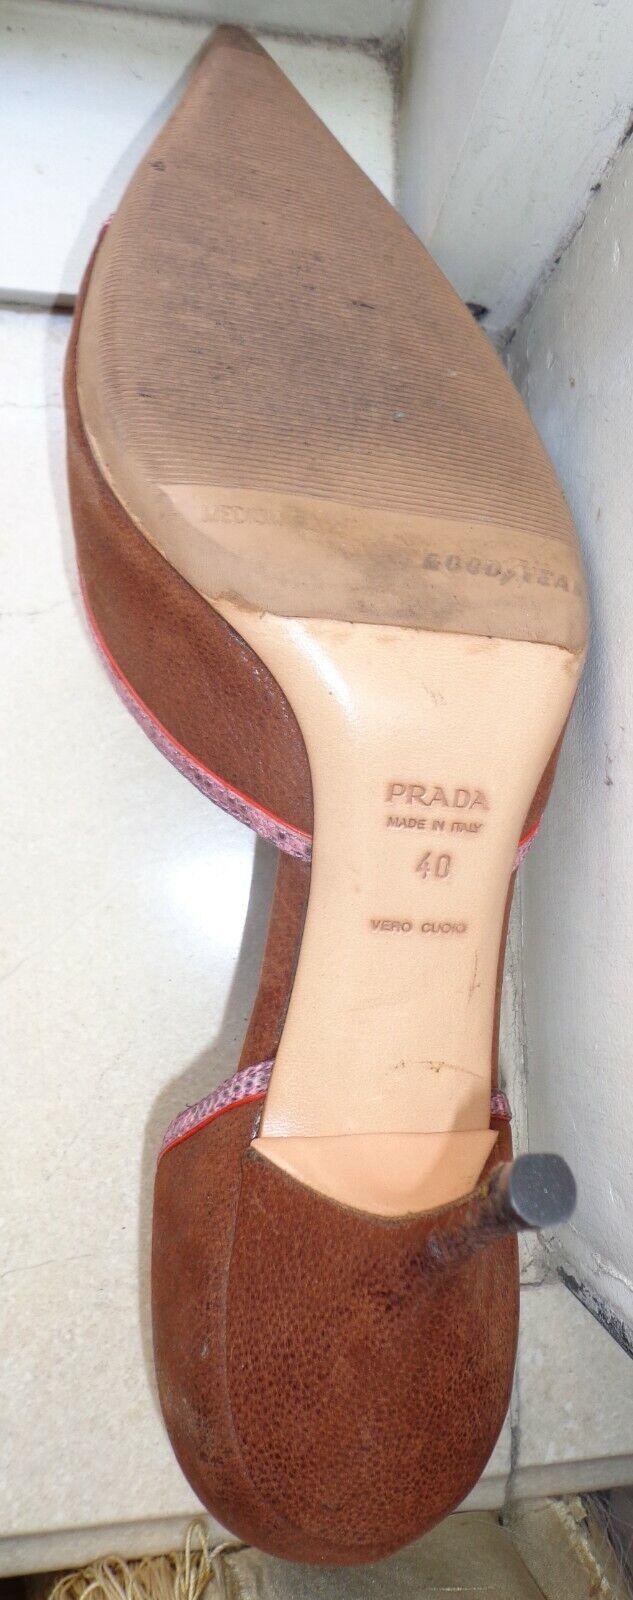 Vintage Prada 1990's D'Orsay Pumps with Pink Liza… - image 5